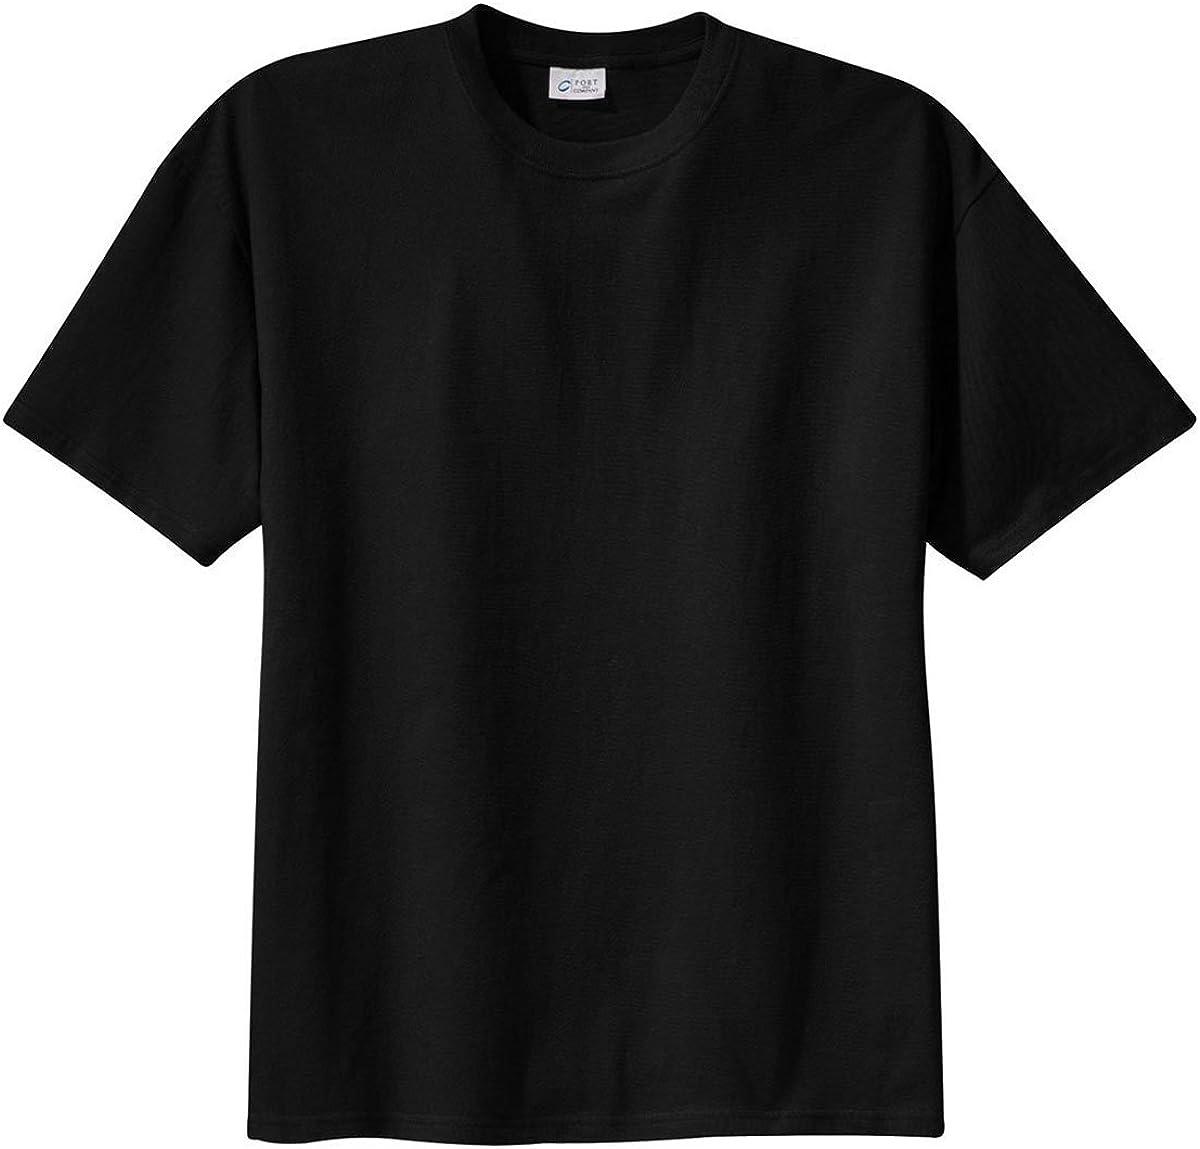 Port & Company Tall 100% Cotton Essential Tshirt PC61T [Misc.] Black